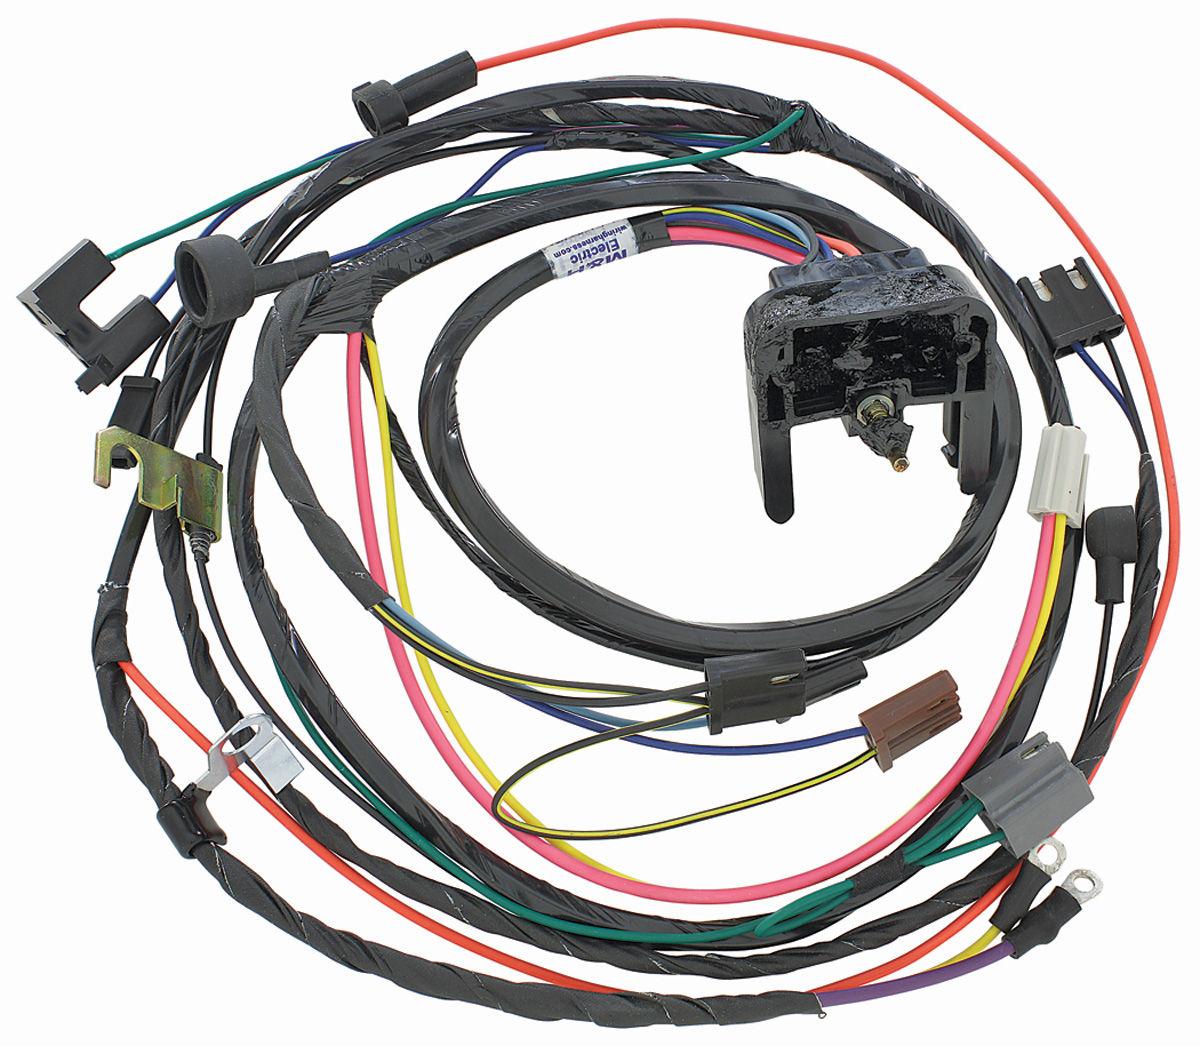 1970 El Camino Wiring Trusted Diagrams 68 Schematic Harness Wire Data Schema U2022 Dashboard